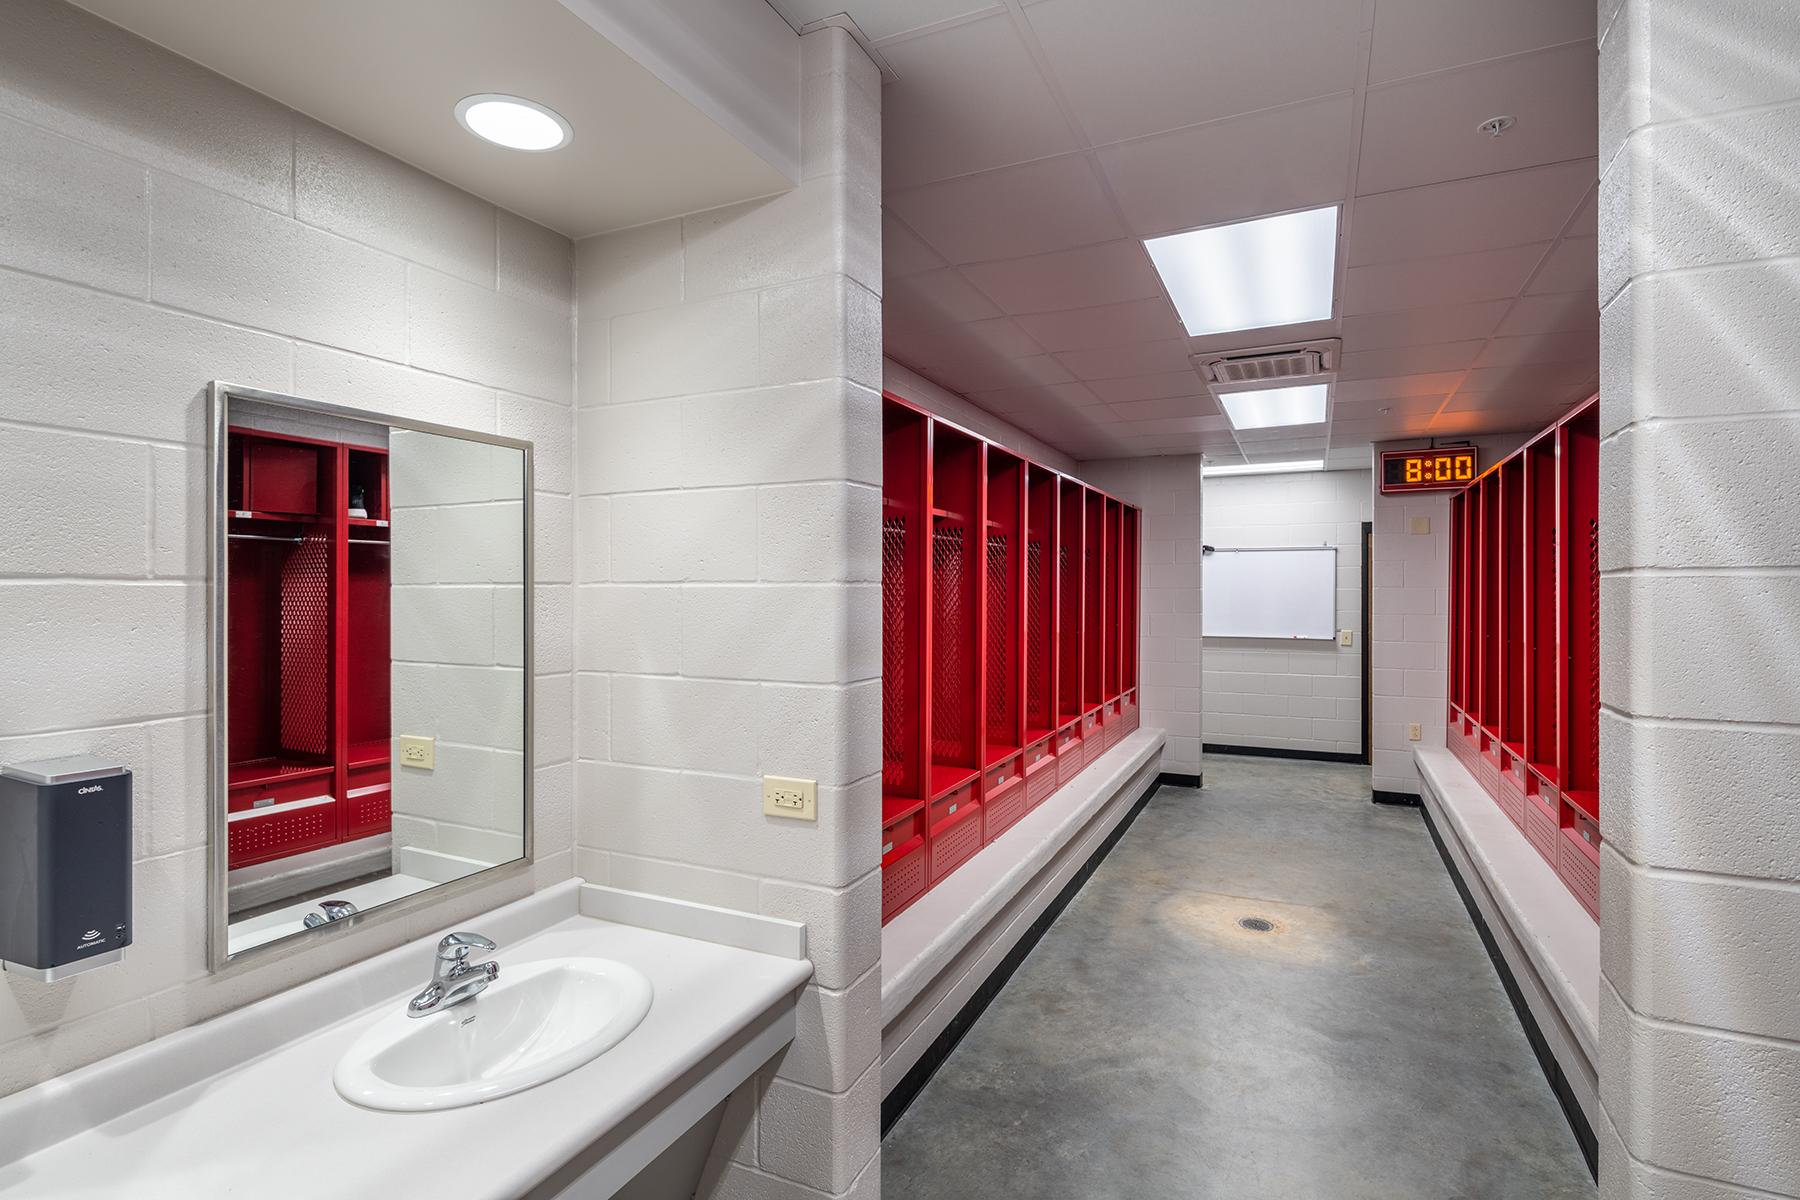 Clarendon-Holly Grove School District Arena – Locker Room